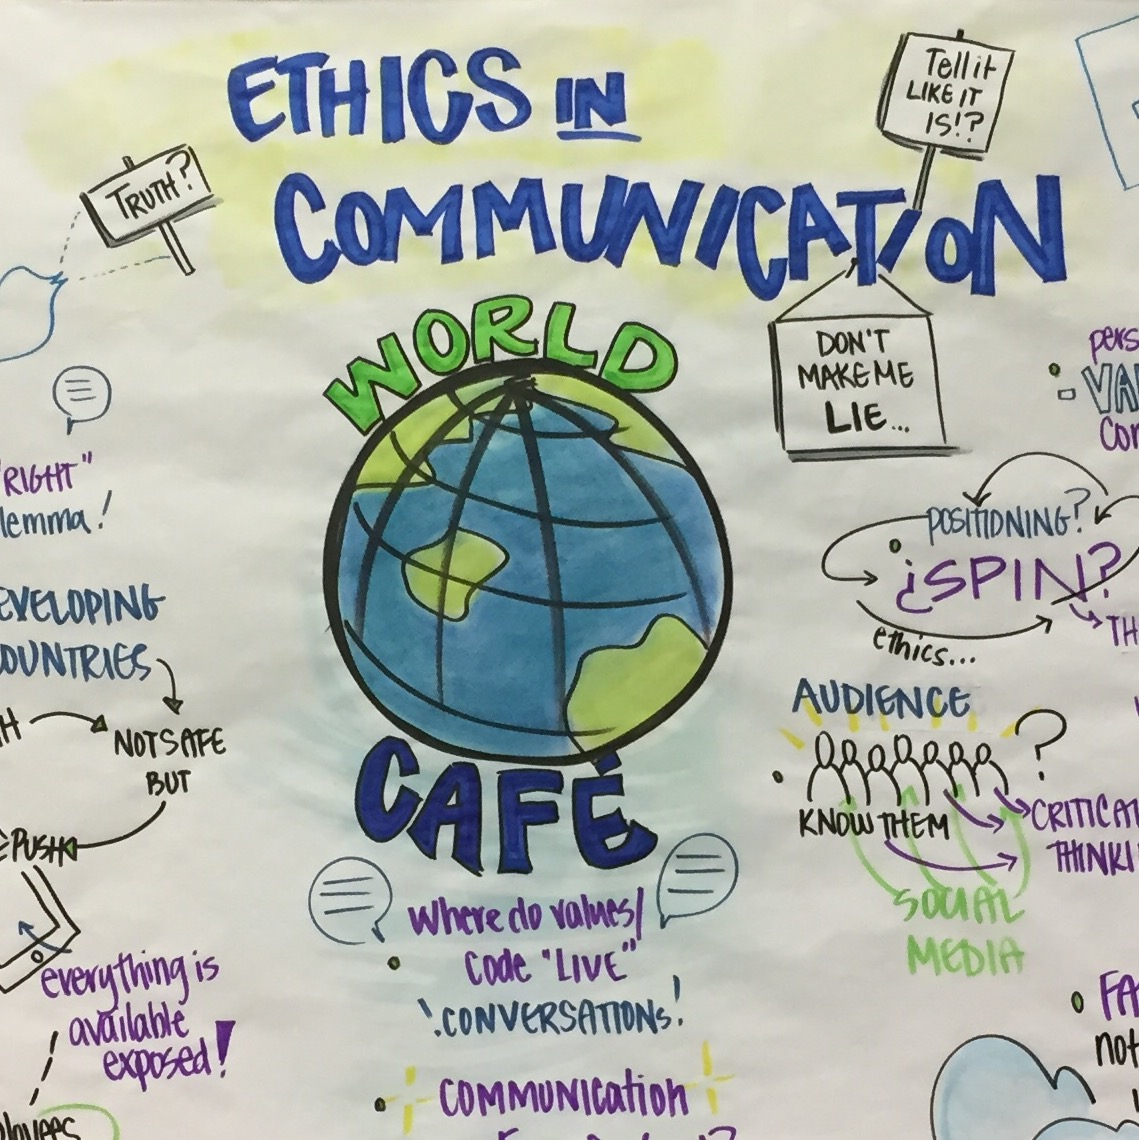 Ethics in Communication